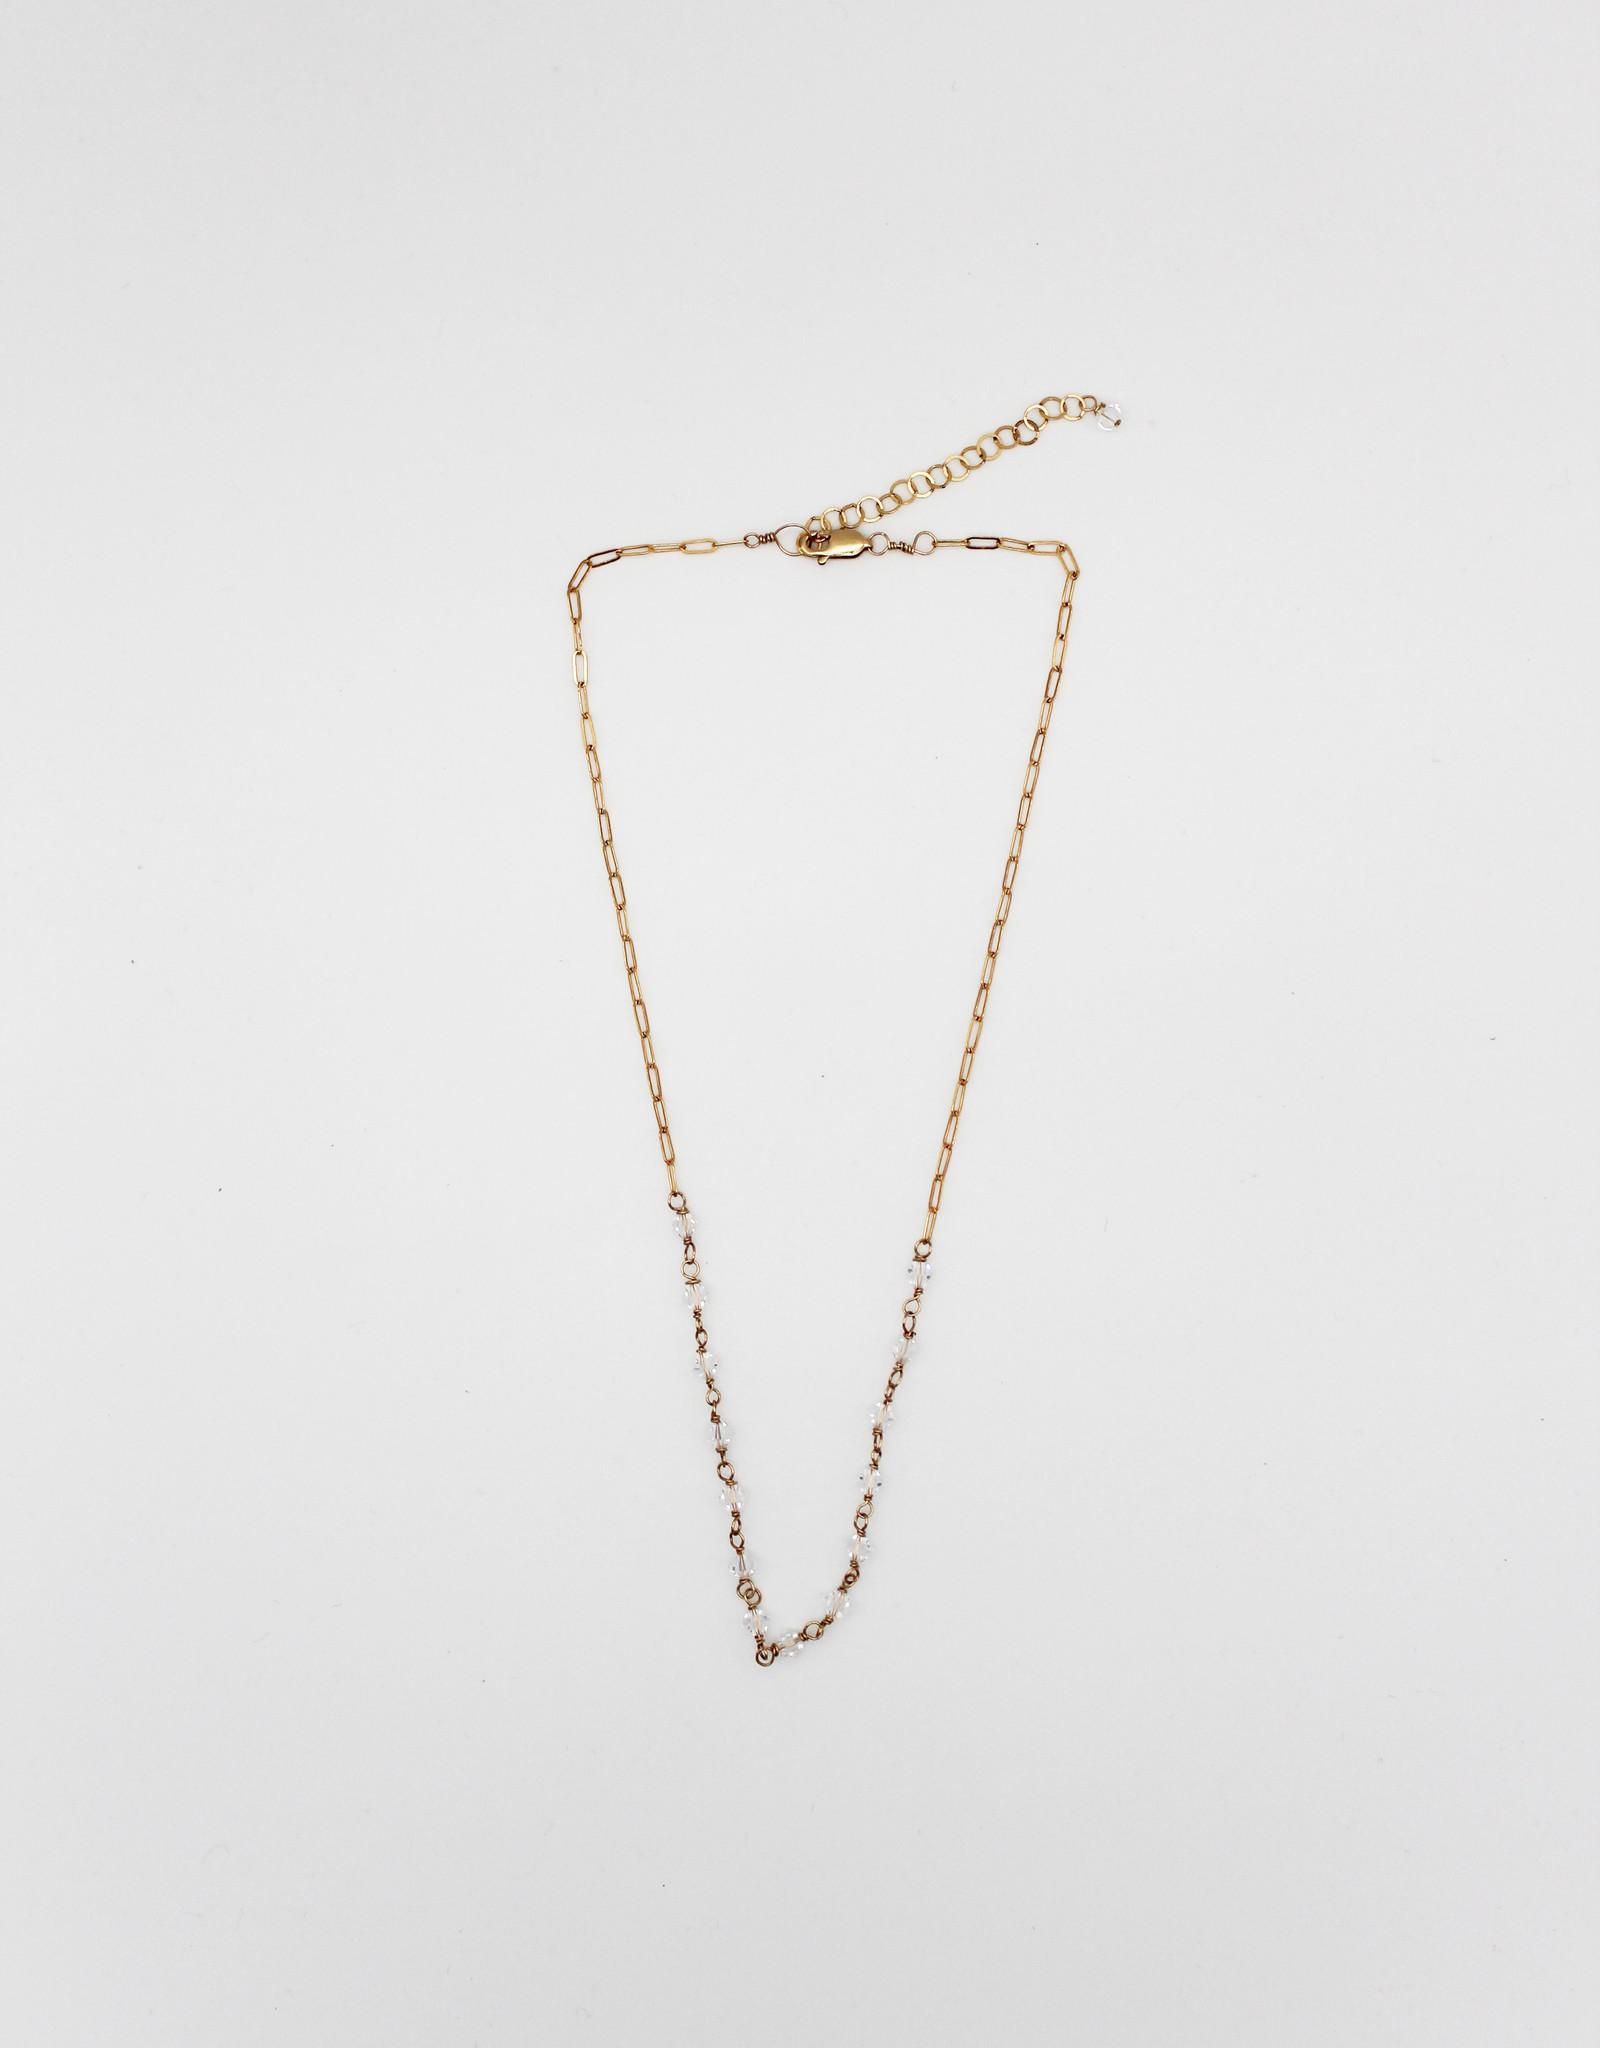 Karla Pattur KP29 Clear Swarovski Crystal 14K Fill Necklace